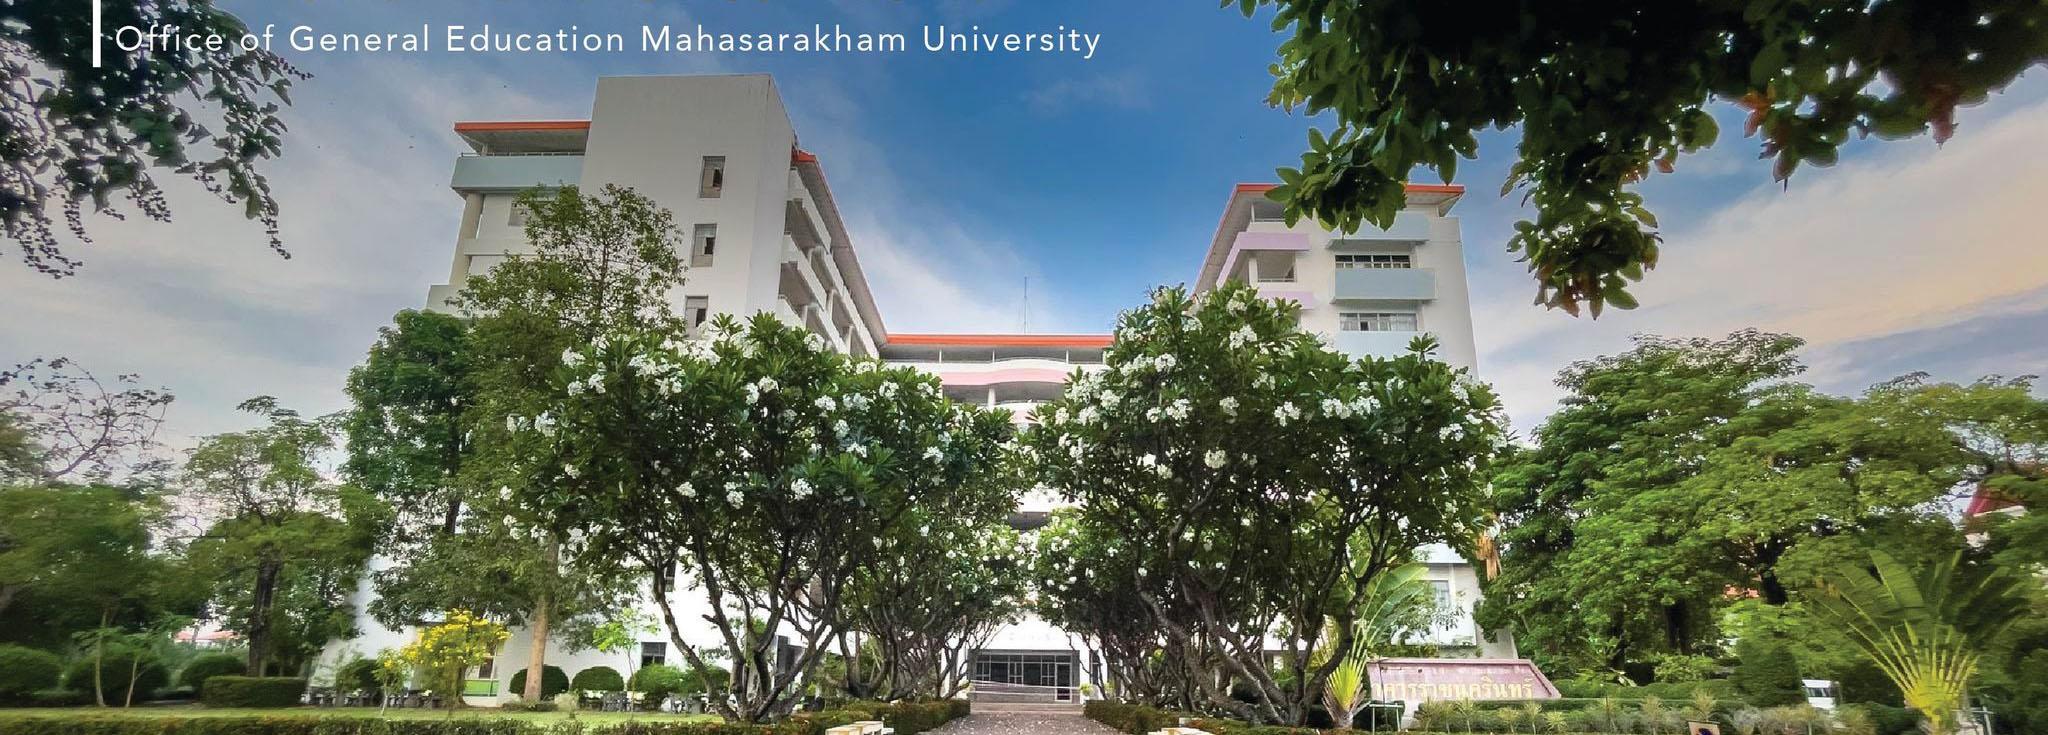 Office of General Education Mahasarakham University   สำนักศึกษาทั่วไป มหาวิทยาลัยมหาสารคาม